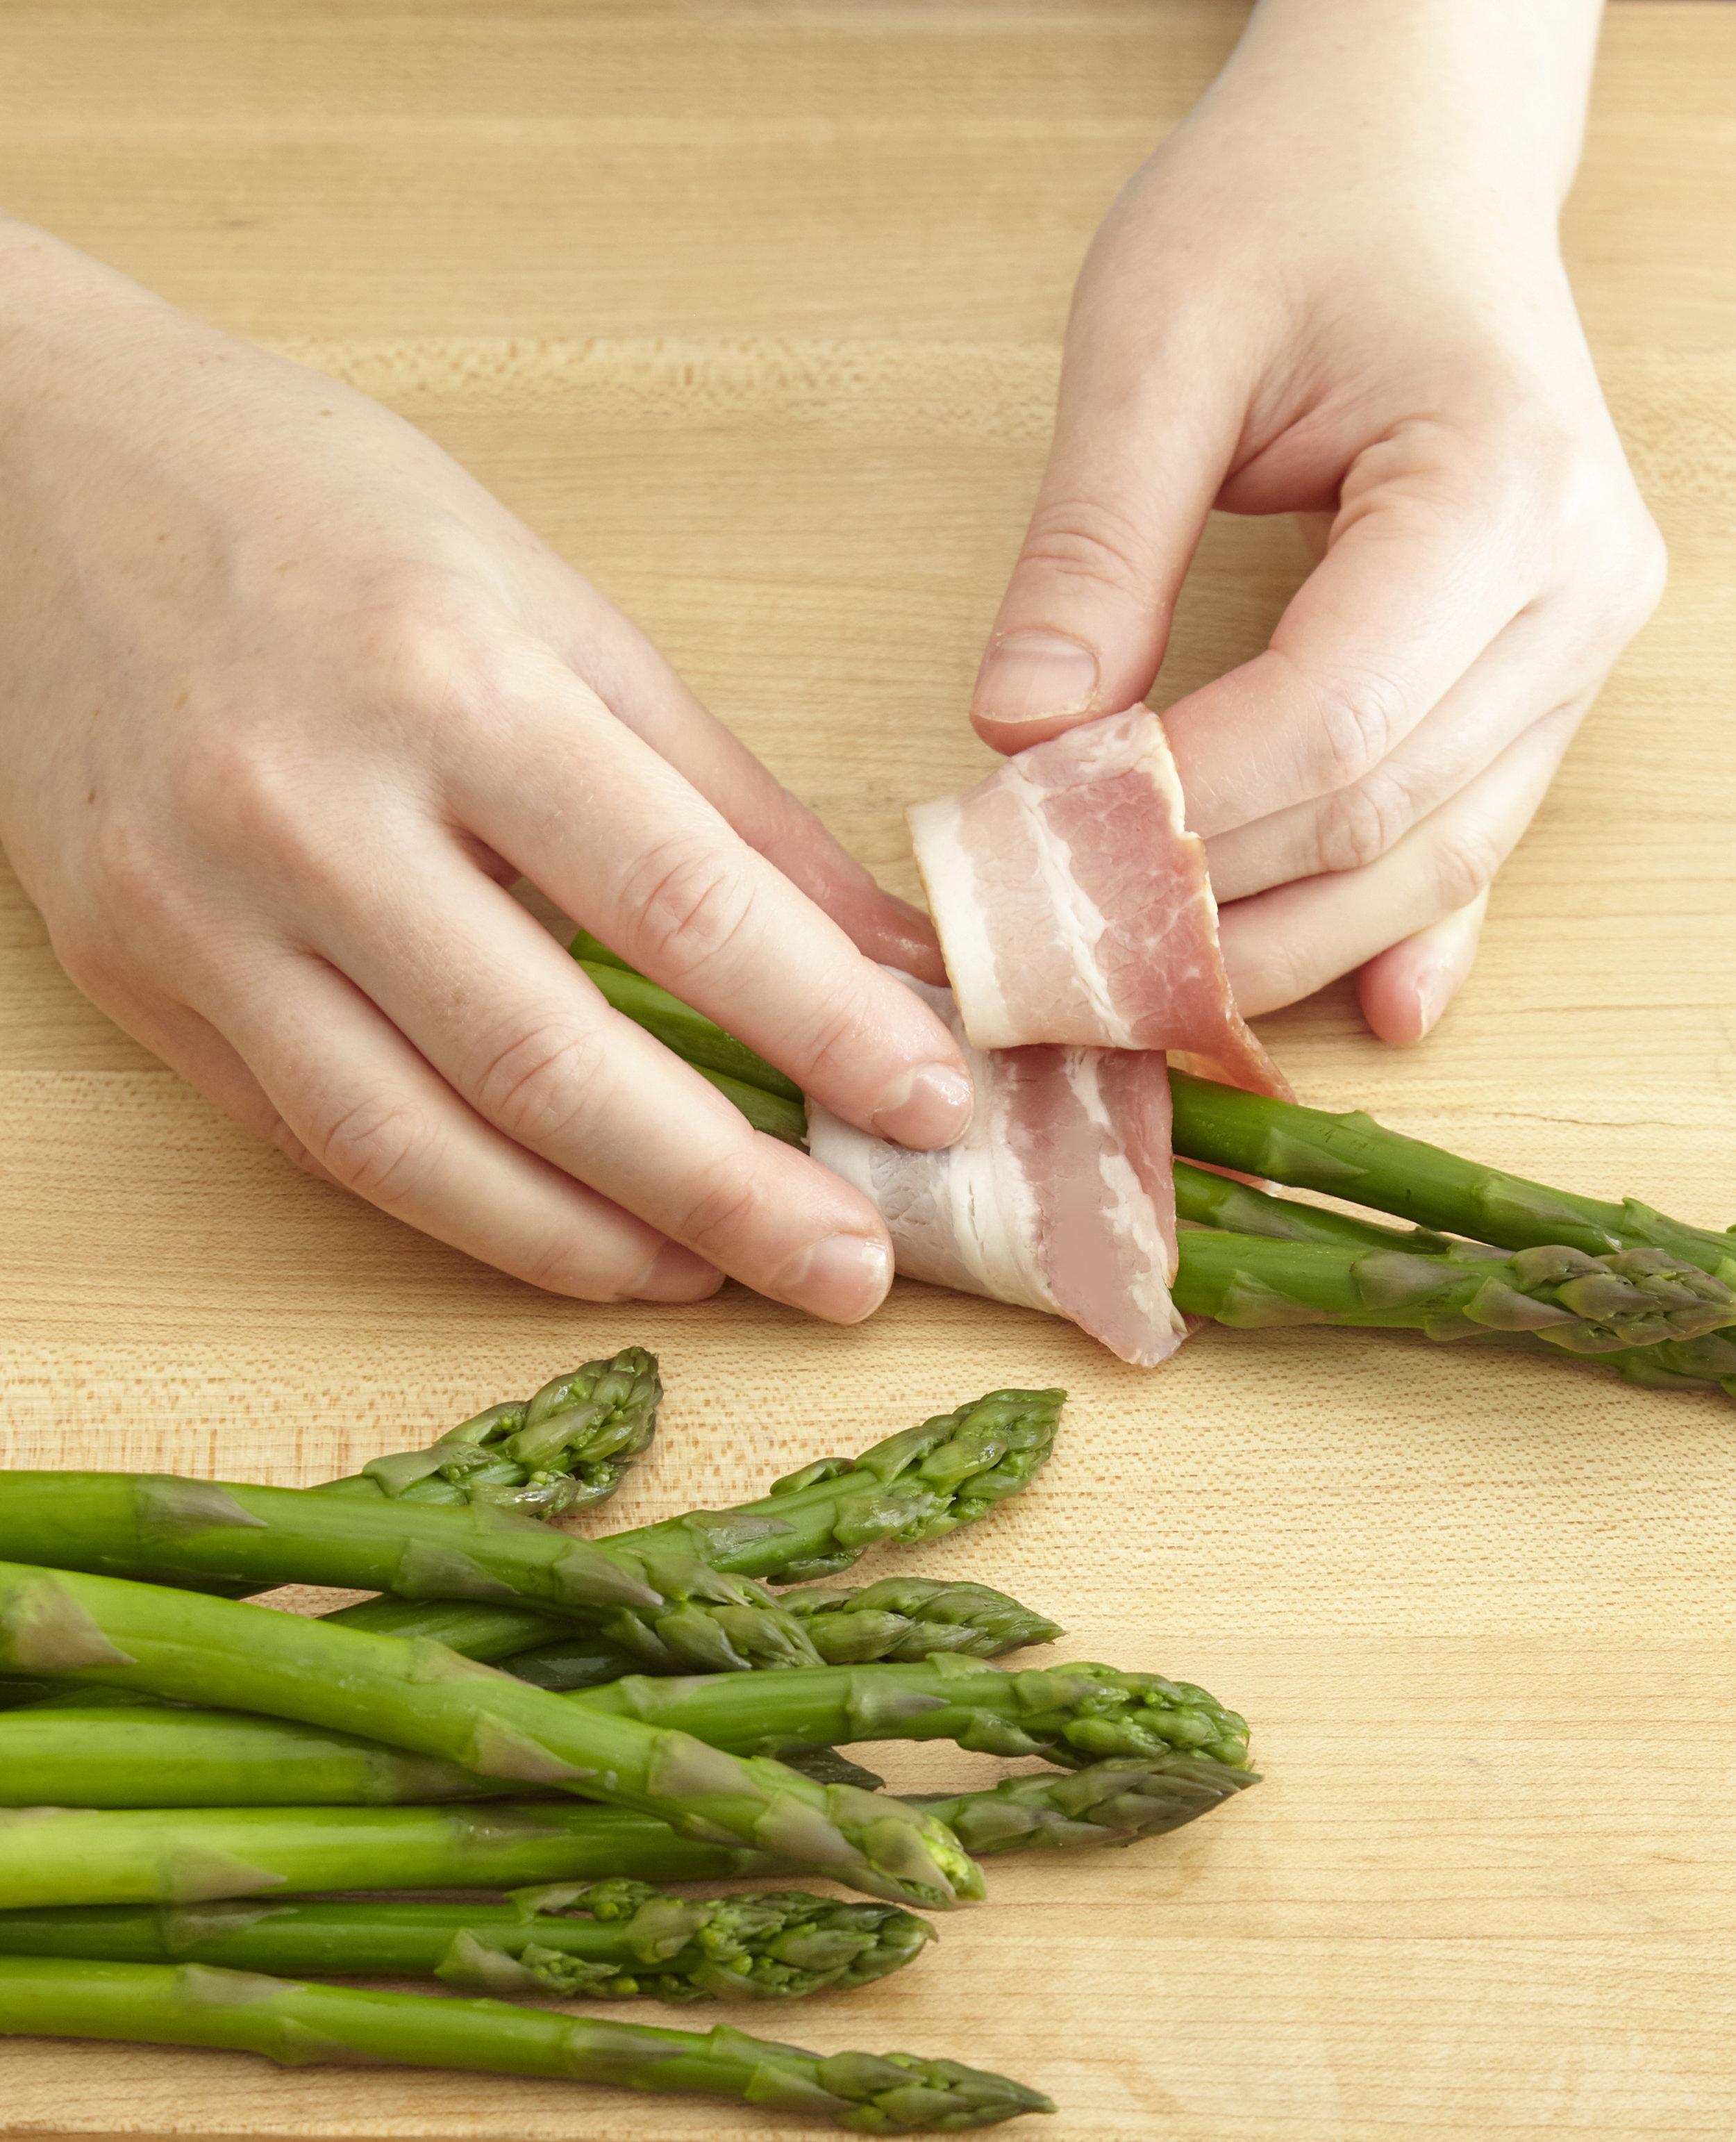 Asparagus_Wrapped_Bacon_Process_Shot_Bacon_&_Butter.jpg